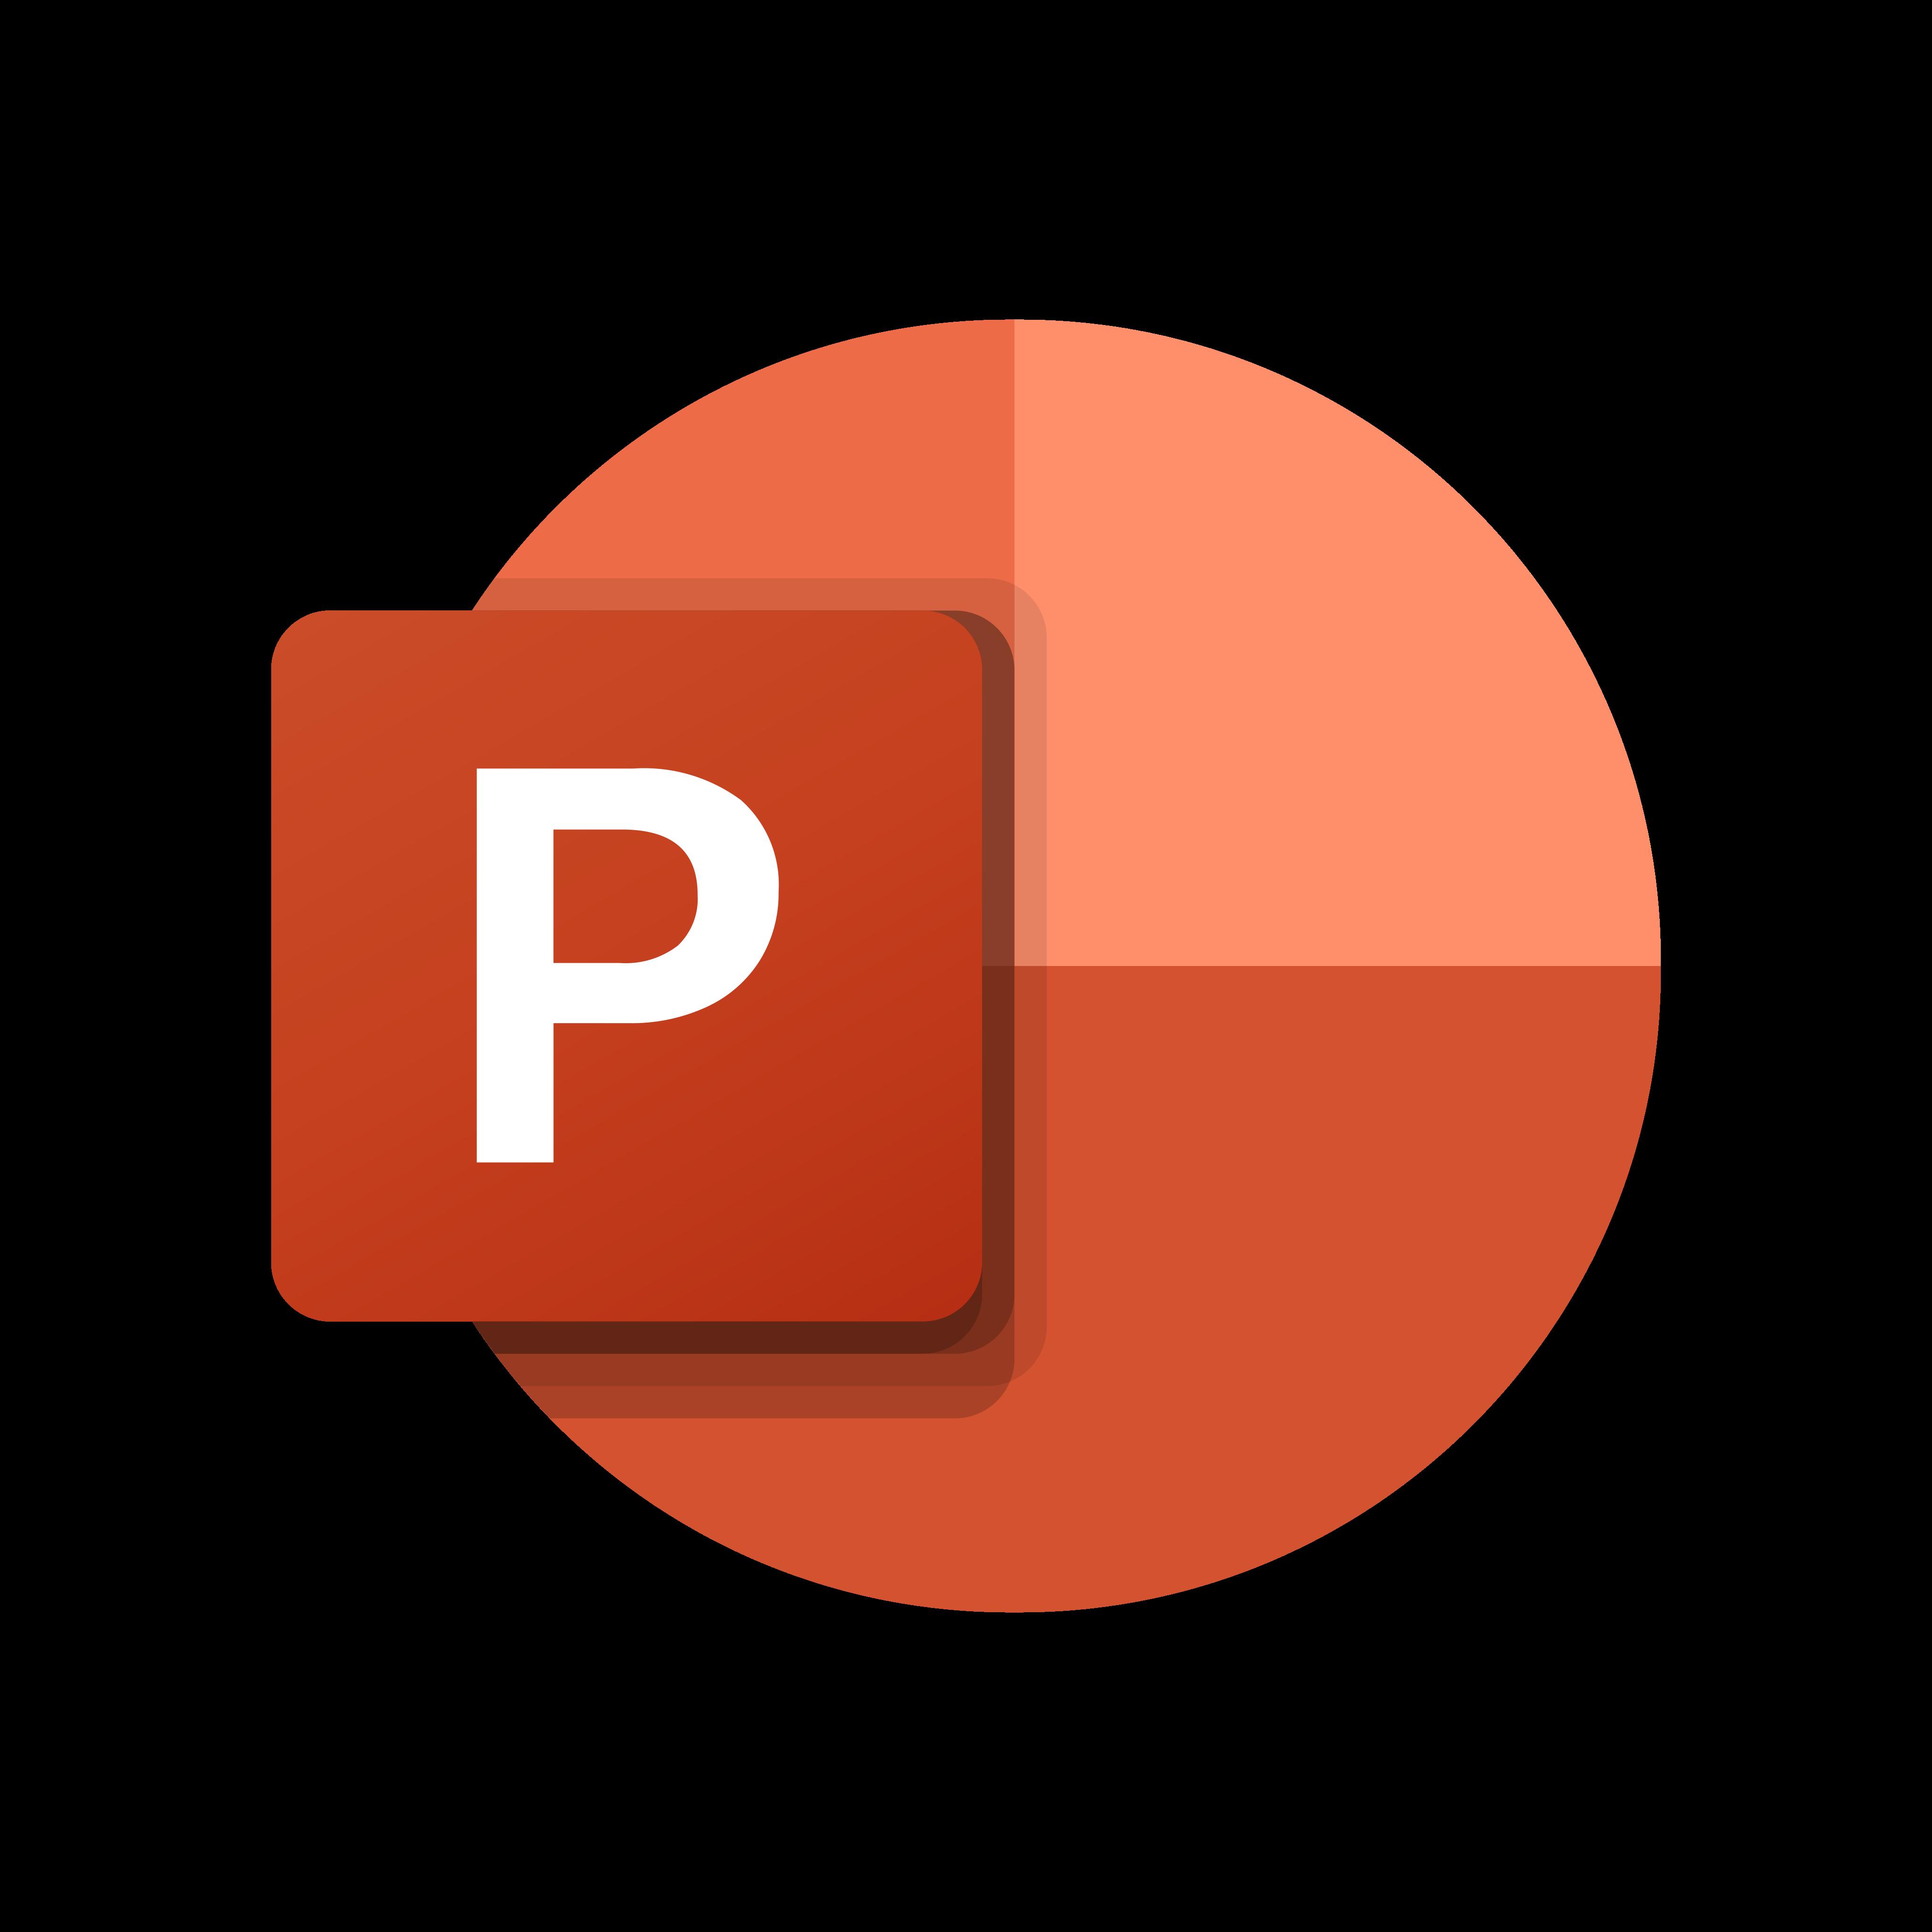 microsoft powerpoint logo 0 - Microsoft PowerPoint Logo